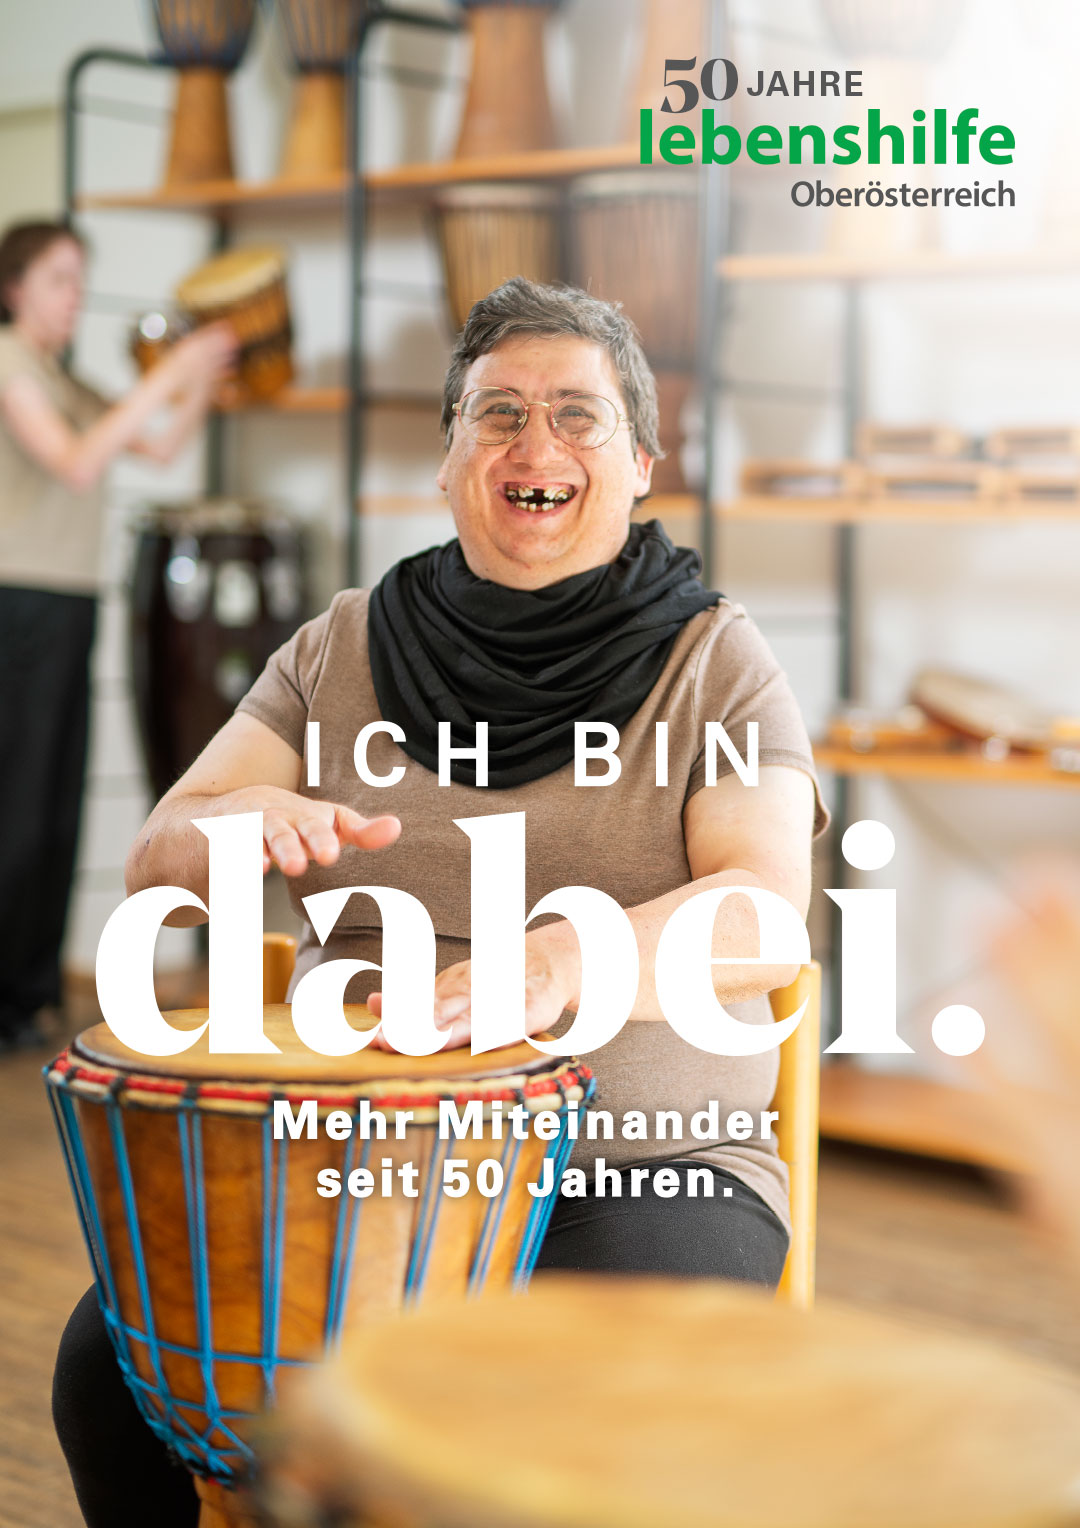 djw-lebenshilfe-hoch-sujet-trommeln